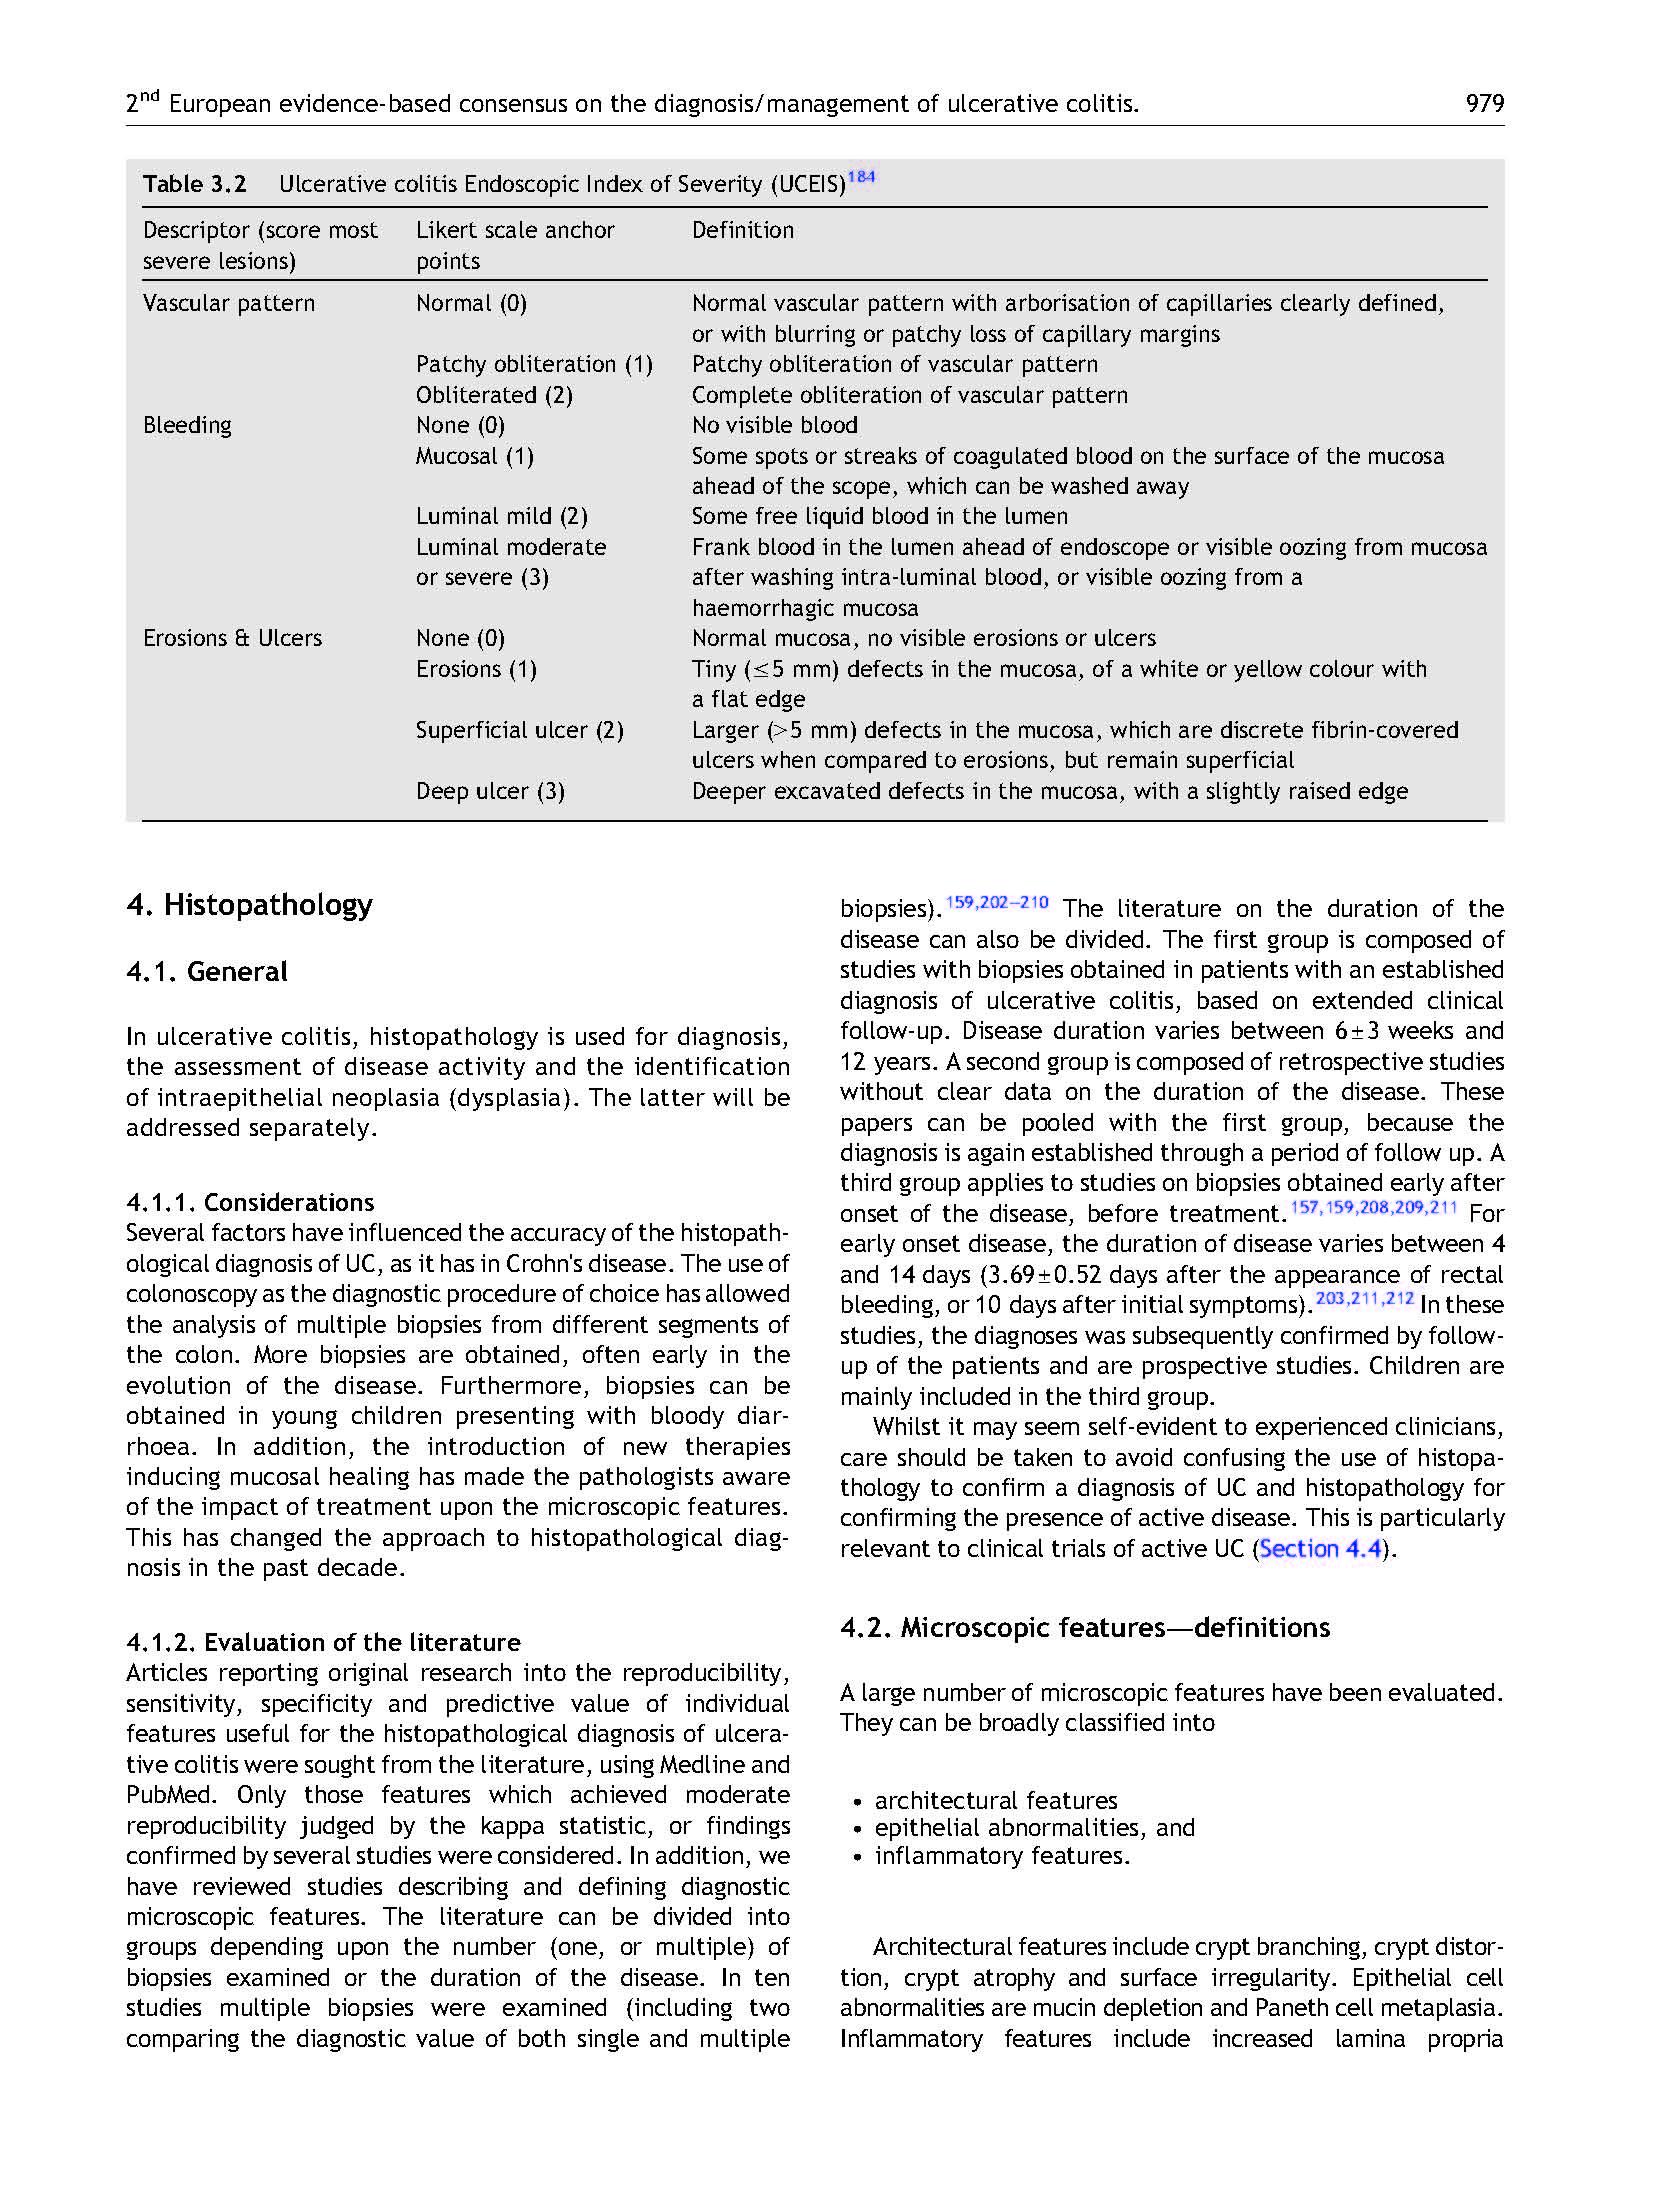 2012-ECCO第二版-欧洲询证共识:溃疡性结肠炎的诊断和处理—定义与诊断_页面_15.jpg